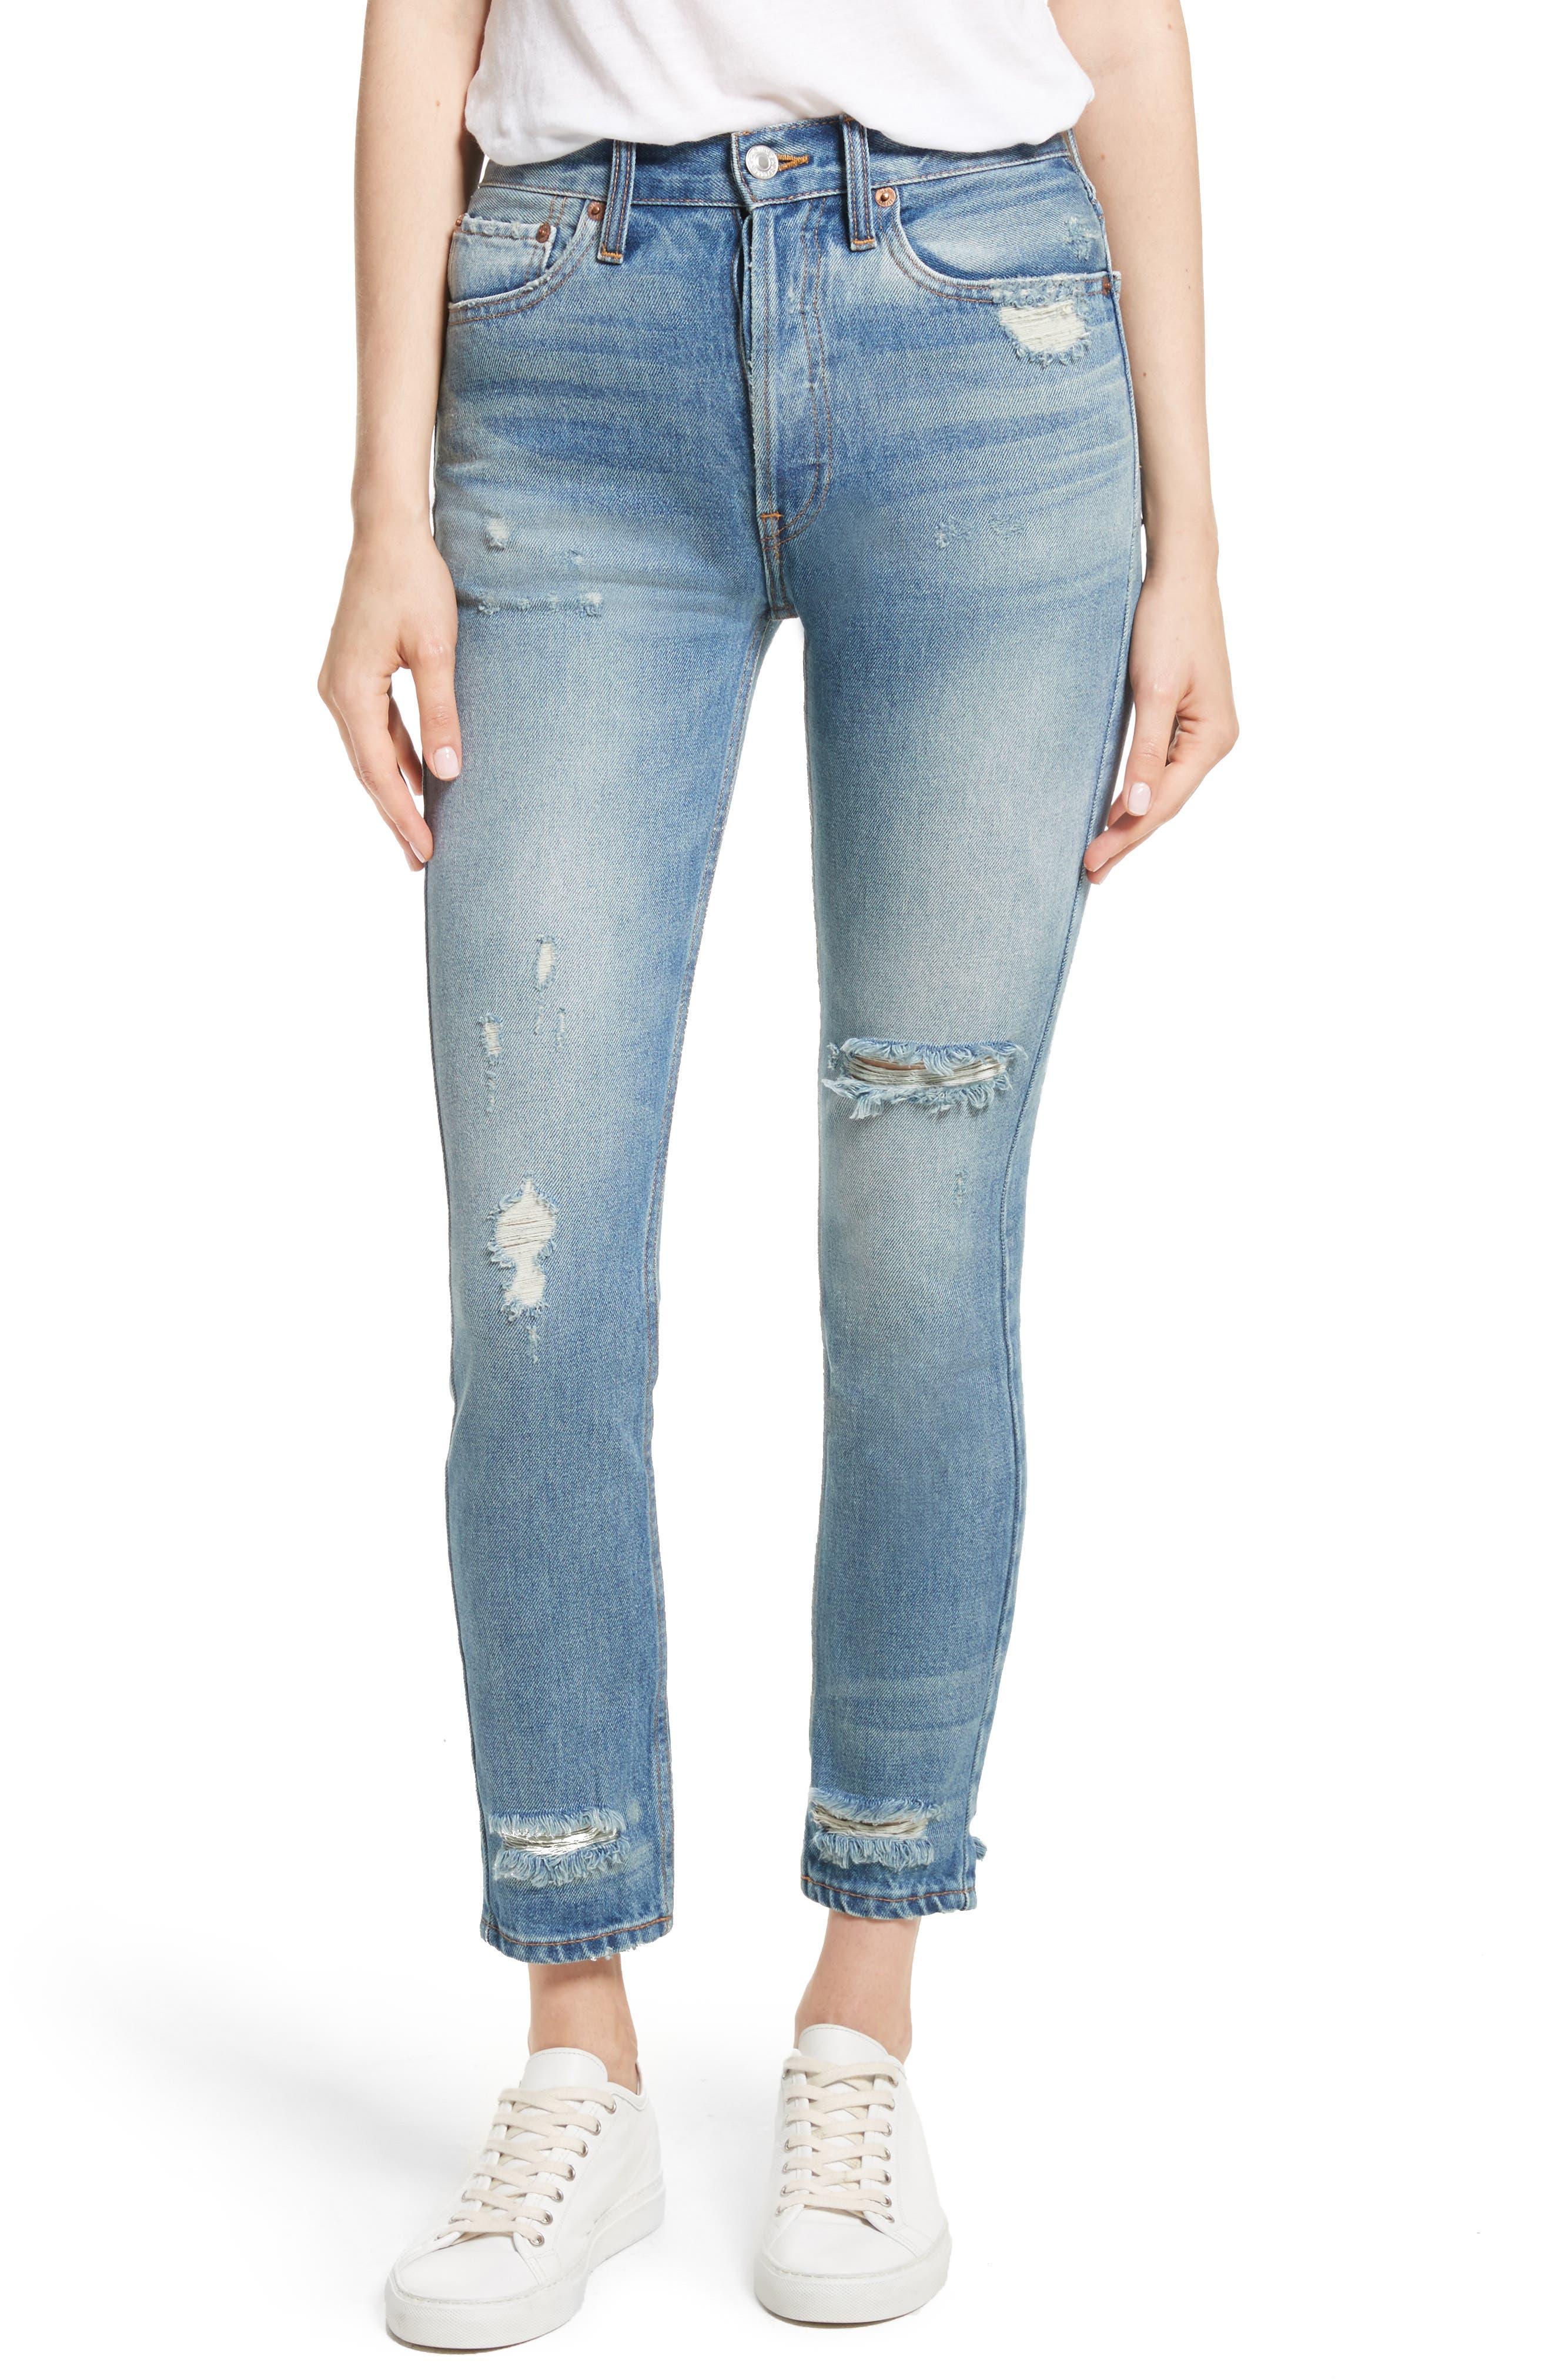 Originals High Waist Jeans,                             Main thumbnail 1, color,                             401